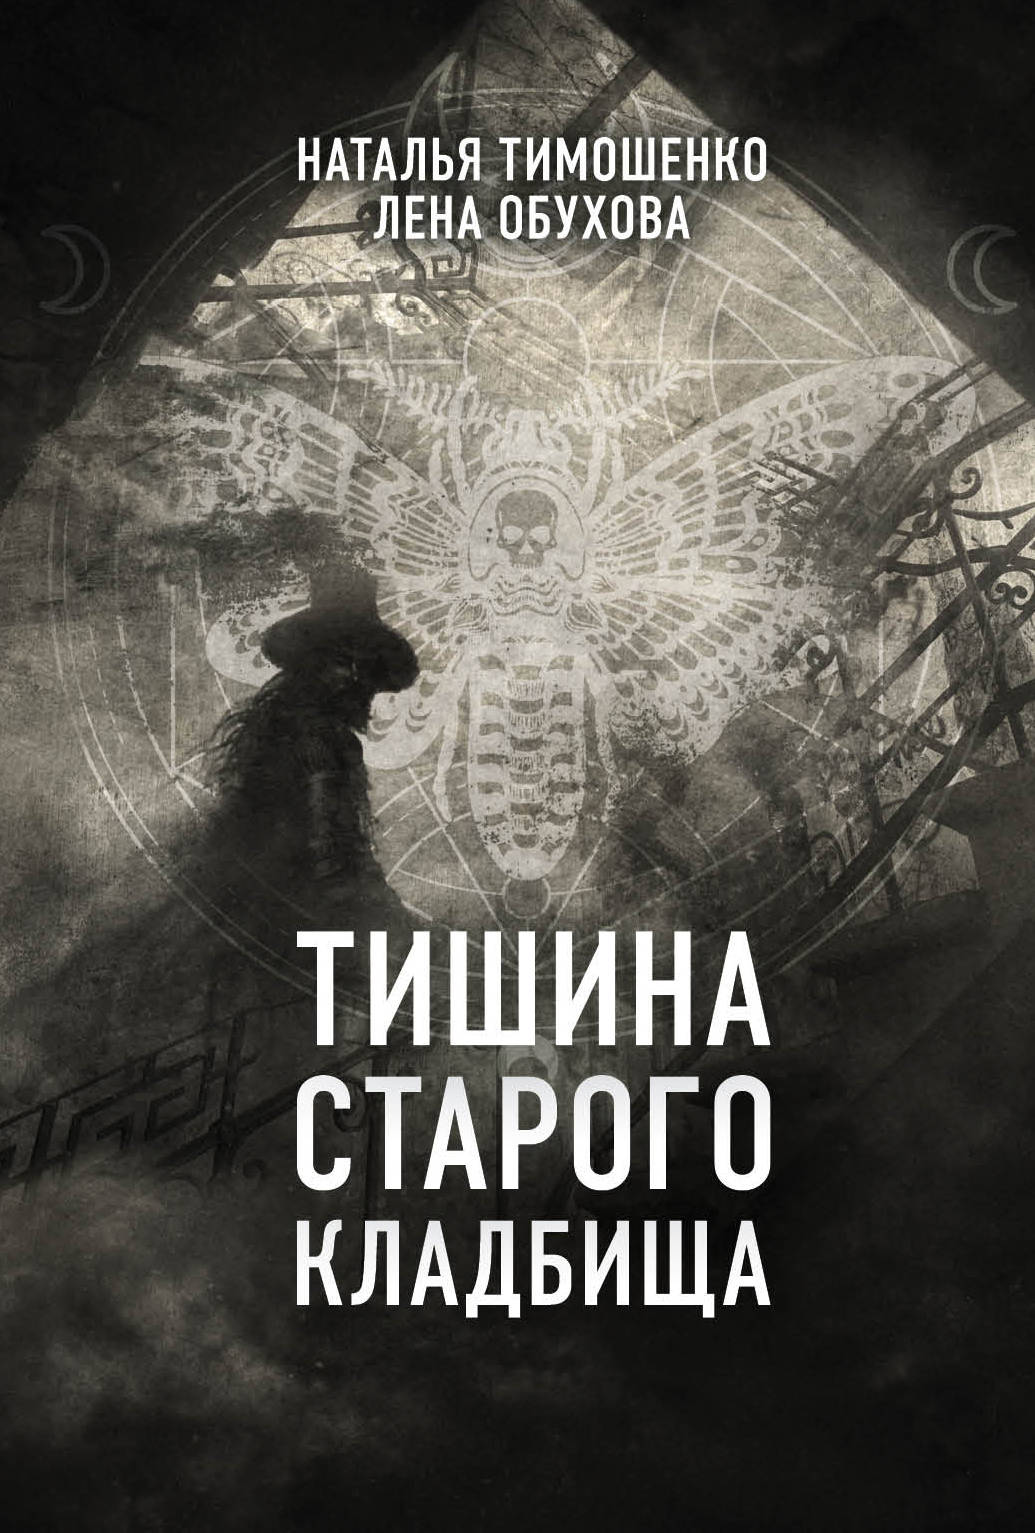 Наталья Тимошенко, Елена Обухова Тишина старого кладбища цена